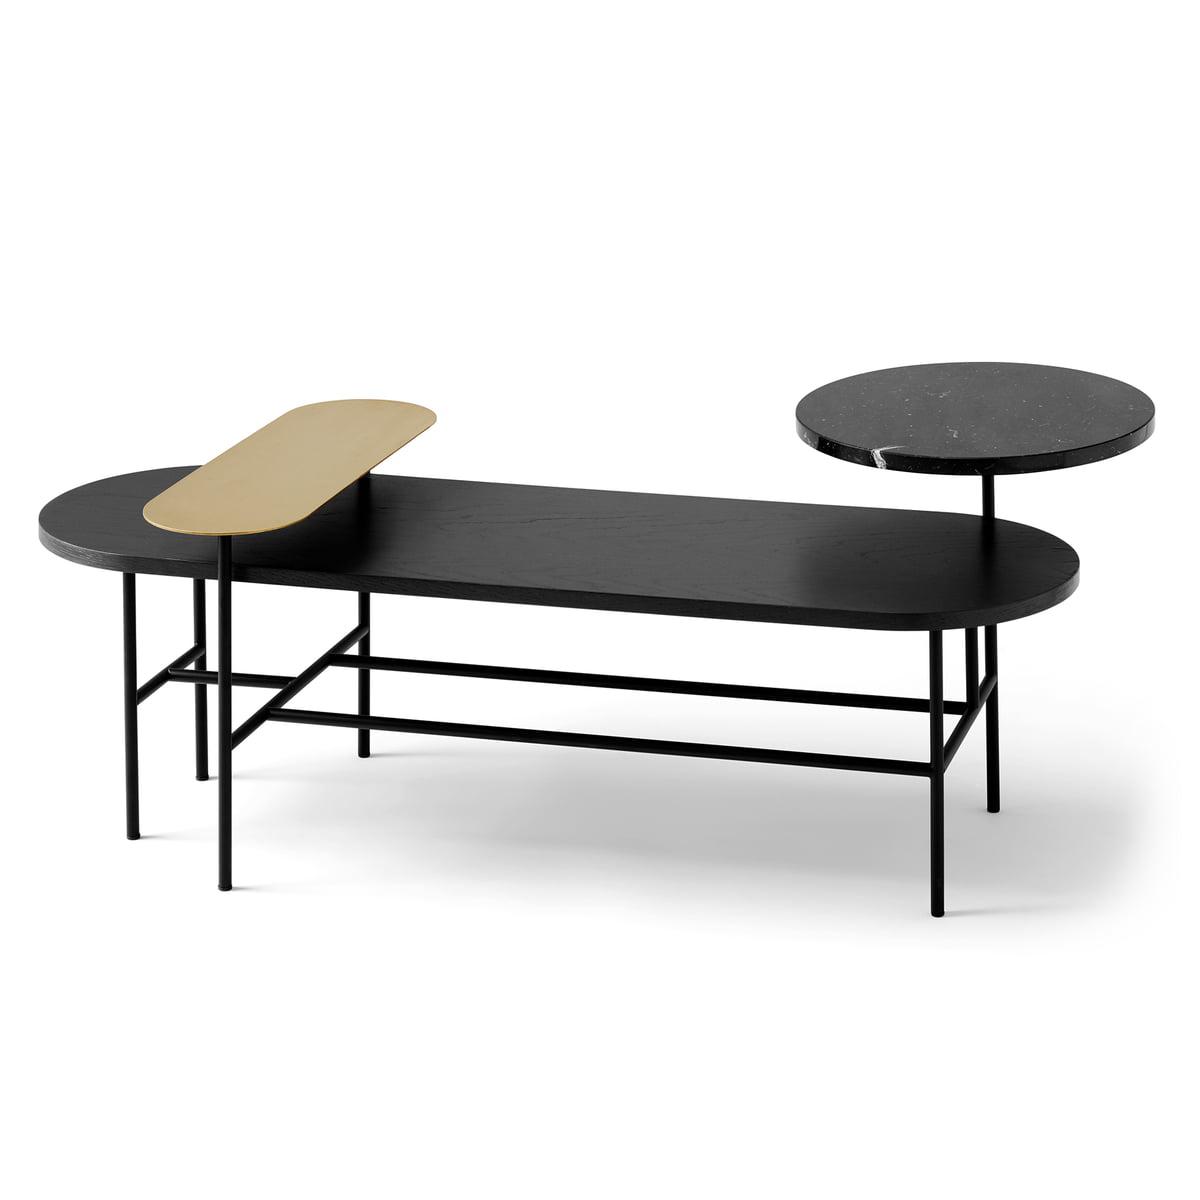 Industriel Table Basse Palette &tradition - palette table jh7, black